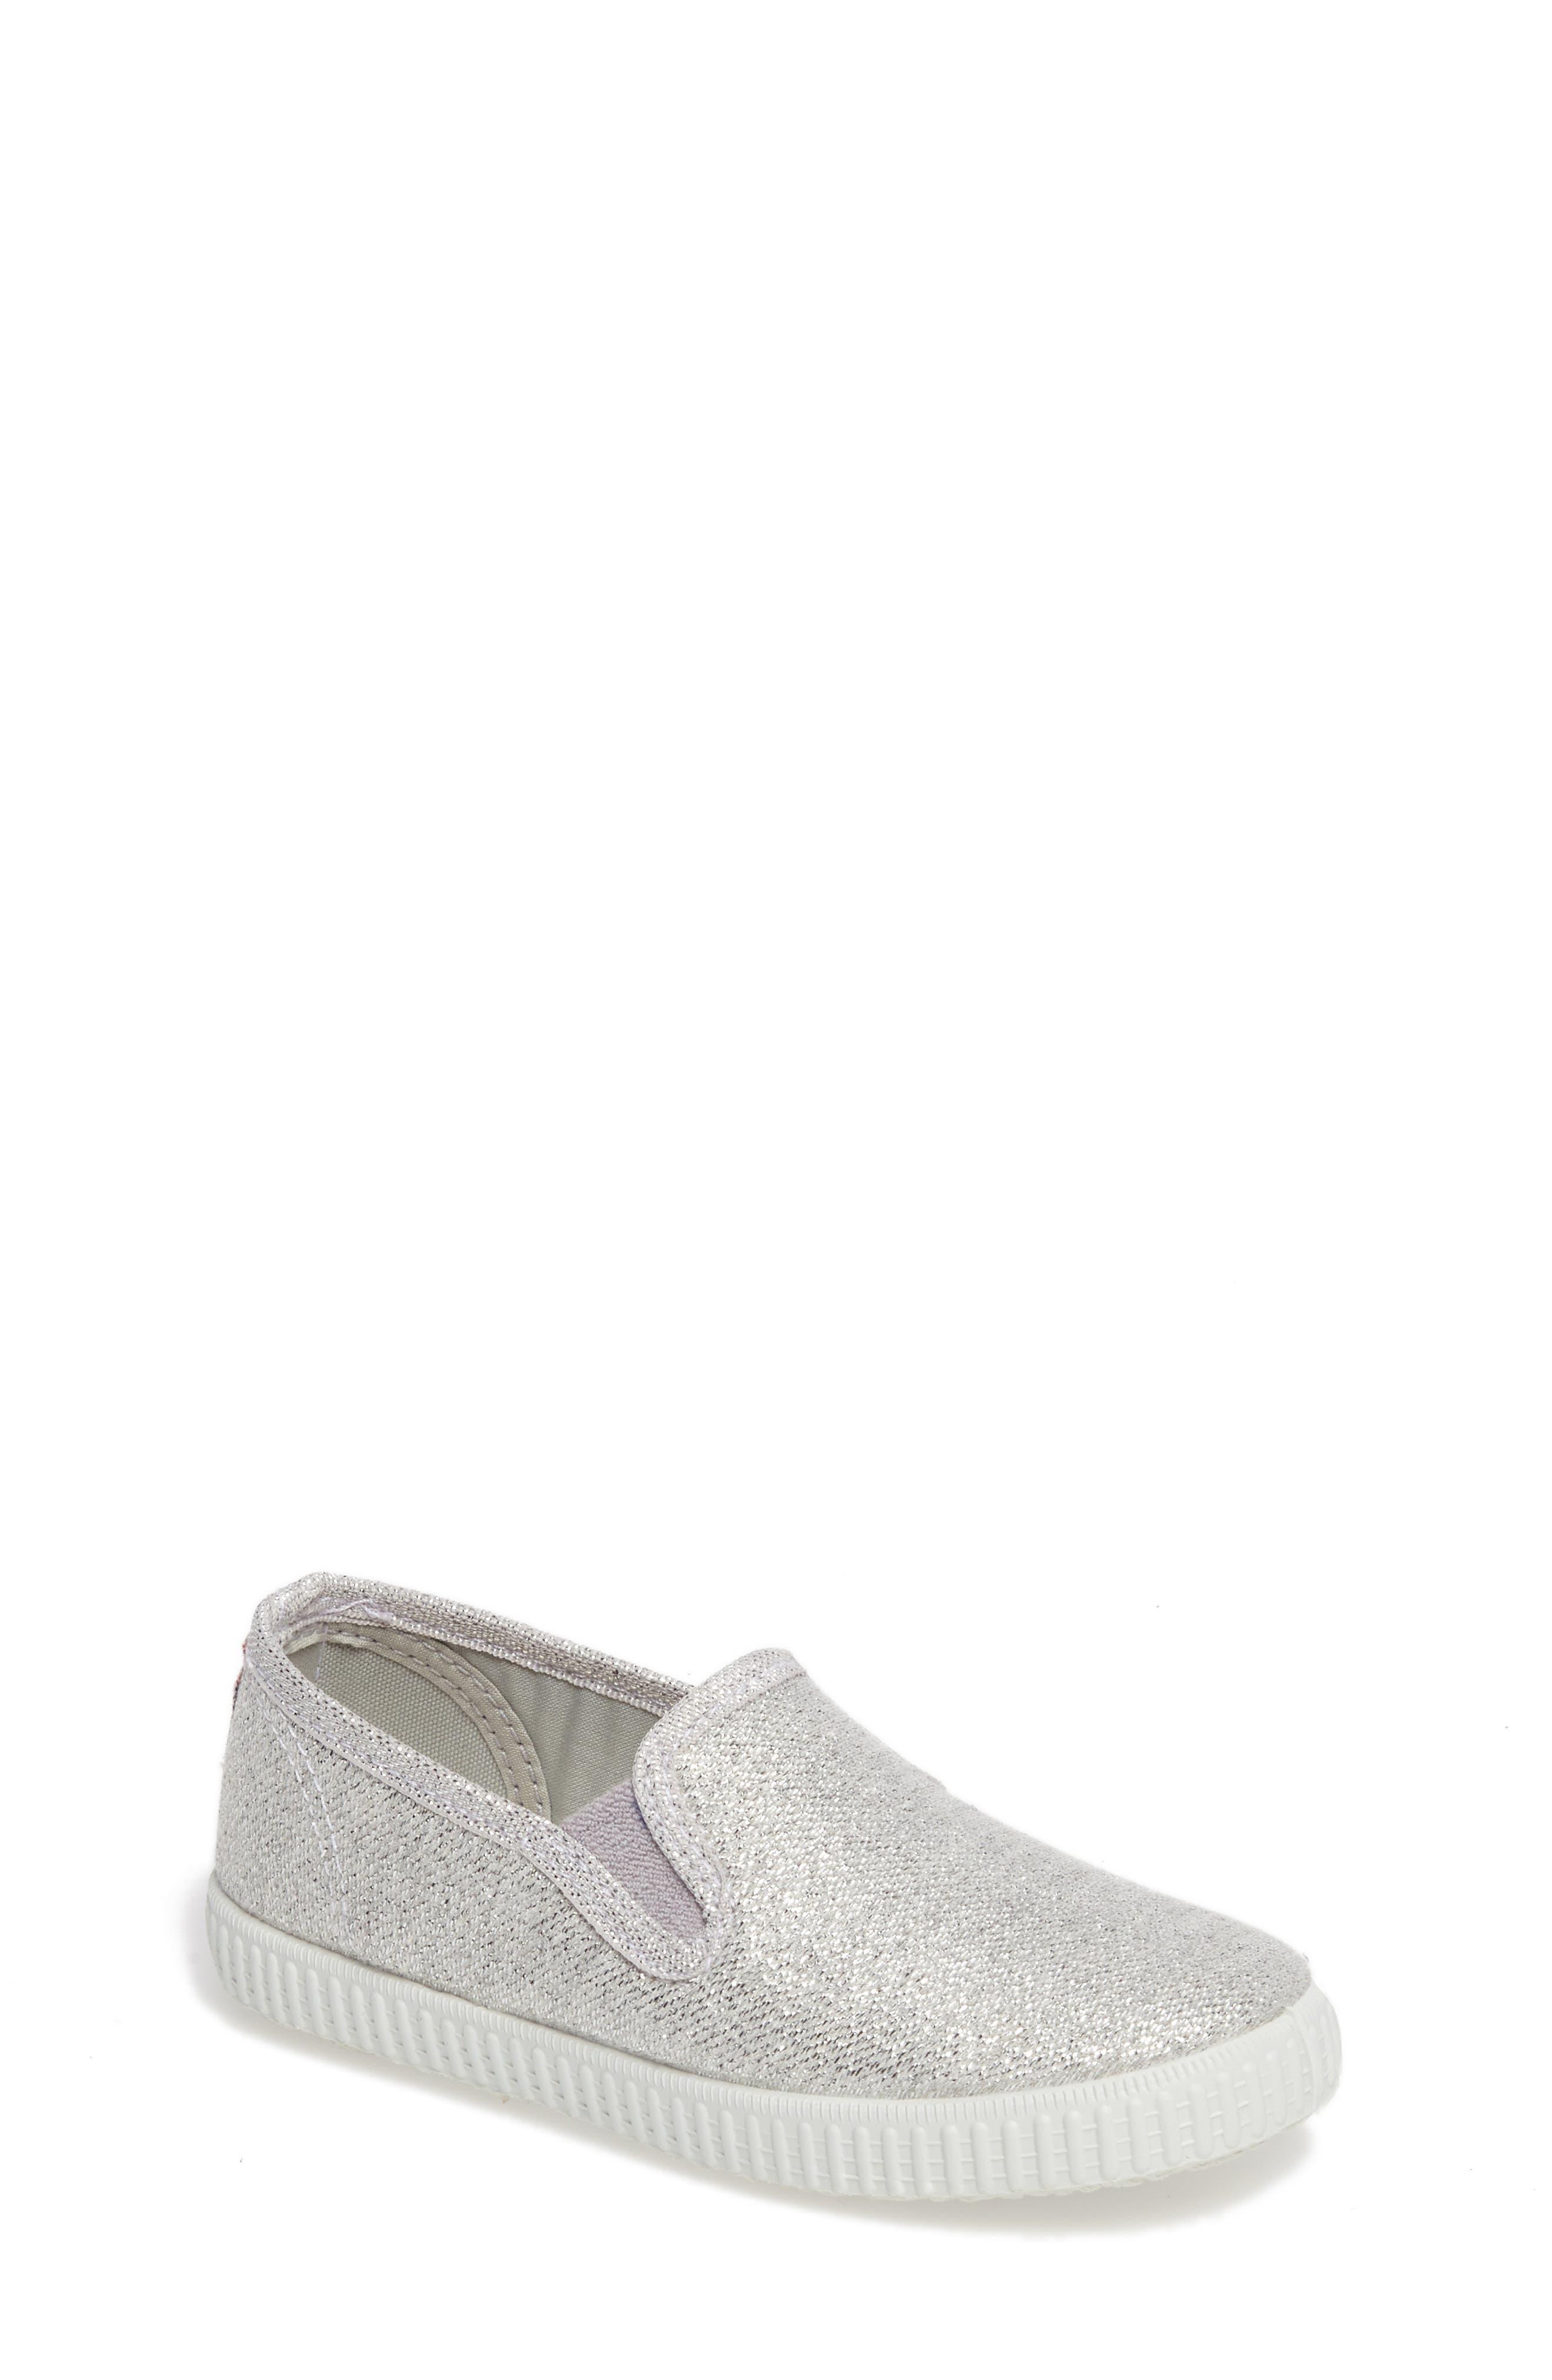 Glitter Slip-On Sneaker,                         Main,                         color, SILVER